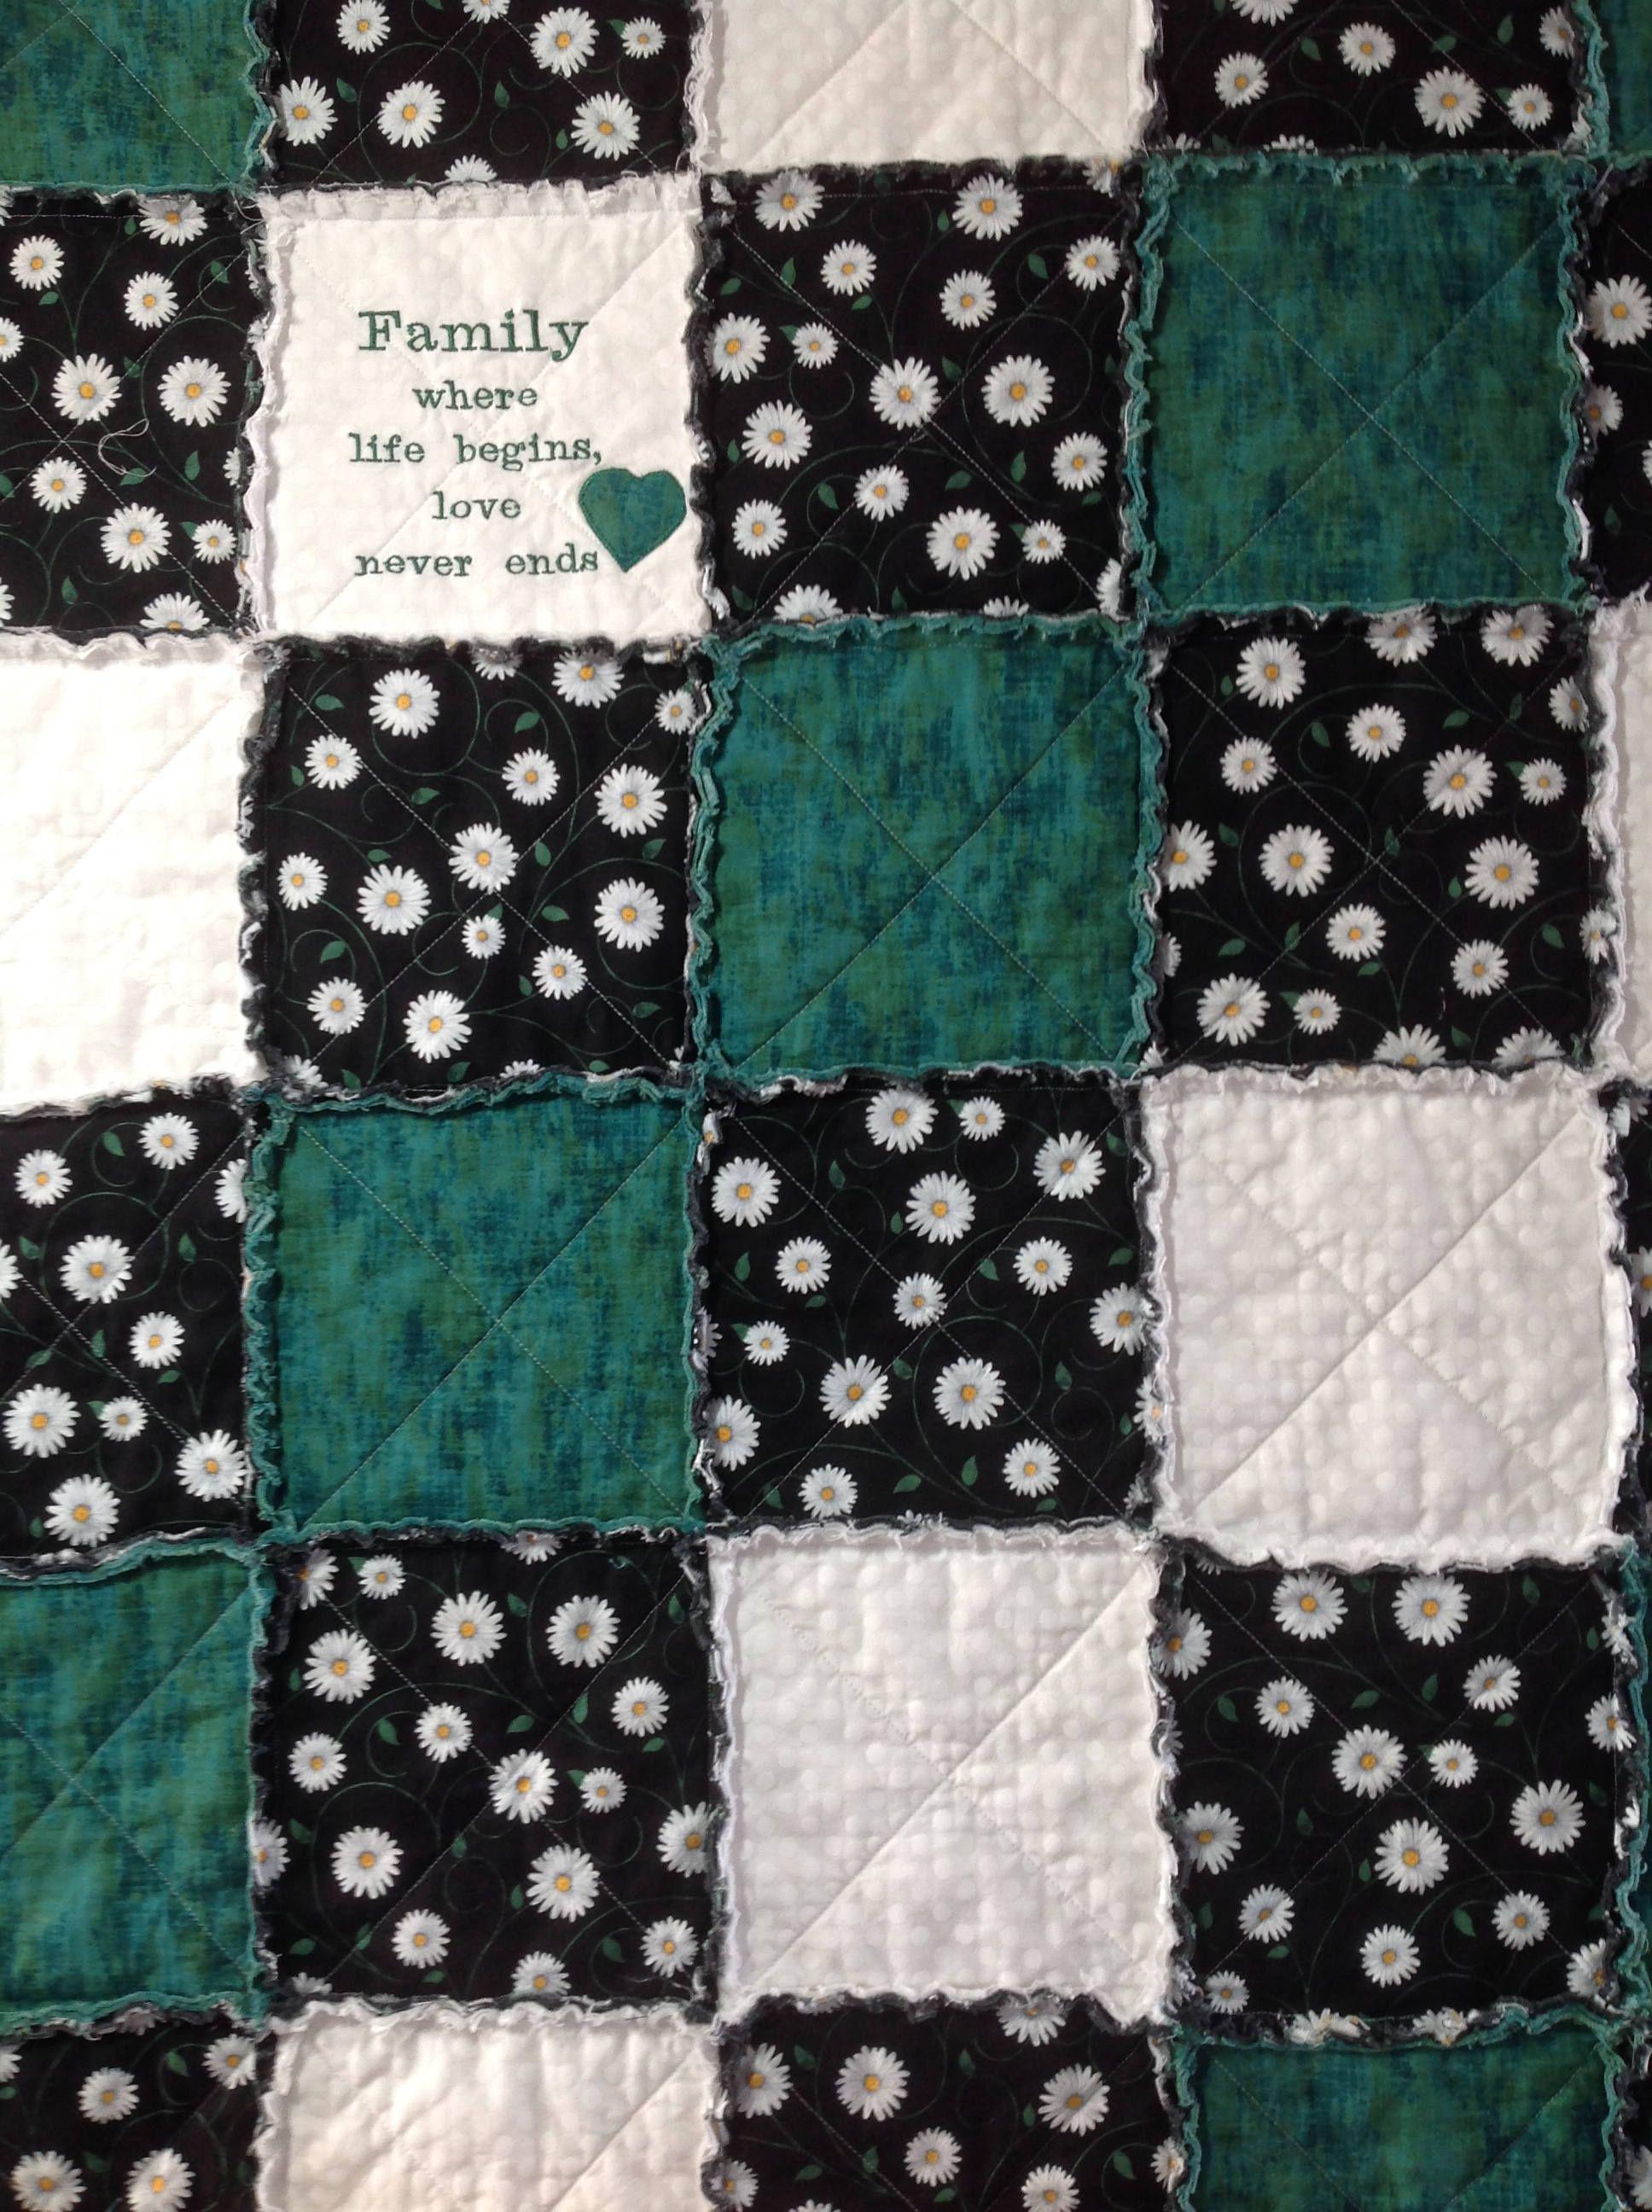 Handmade Quilt, Rag Quilt, Throw, Floral Quilt, Green Quilt ... : floral quilts for sale - Adamdwight.com